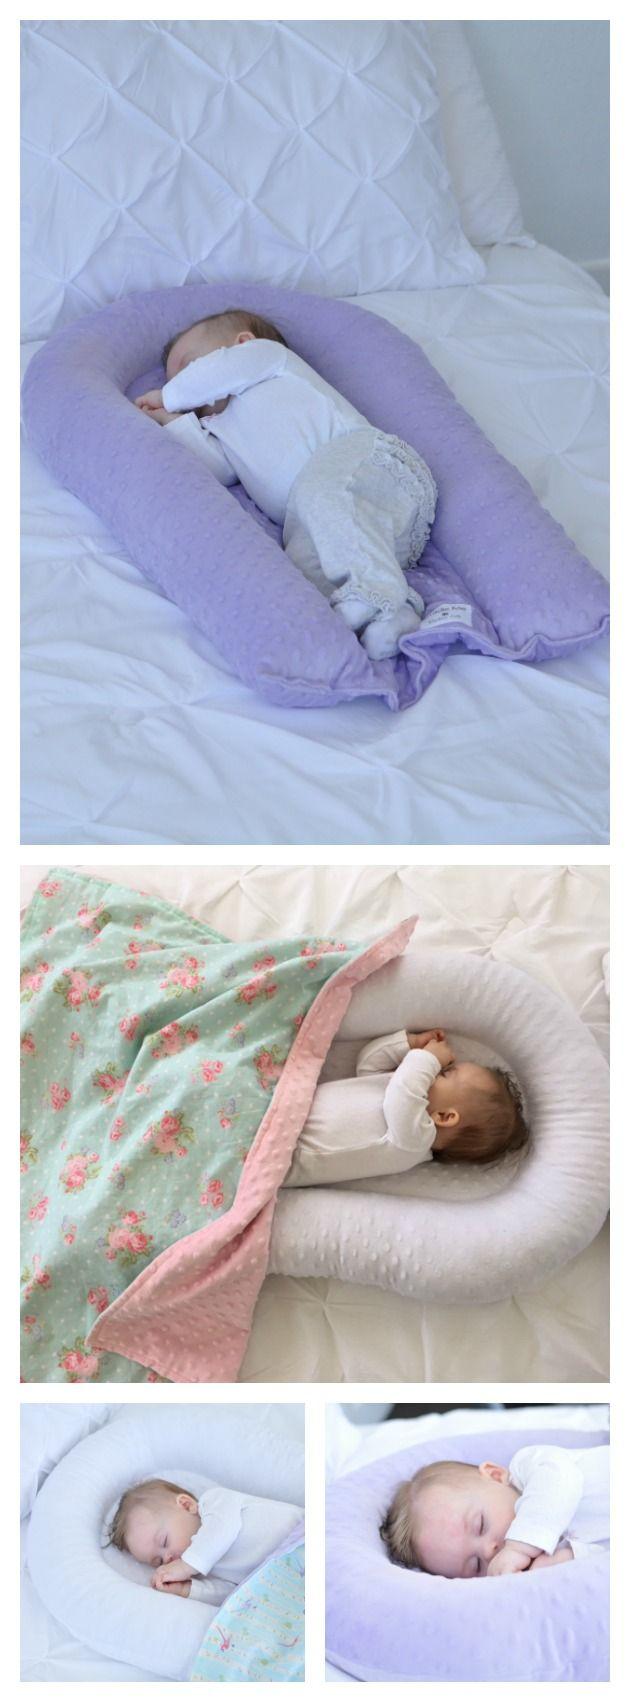 Baby Sleep Pillow Cosleep Baby Nest Baby Lounger Toddler